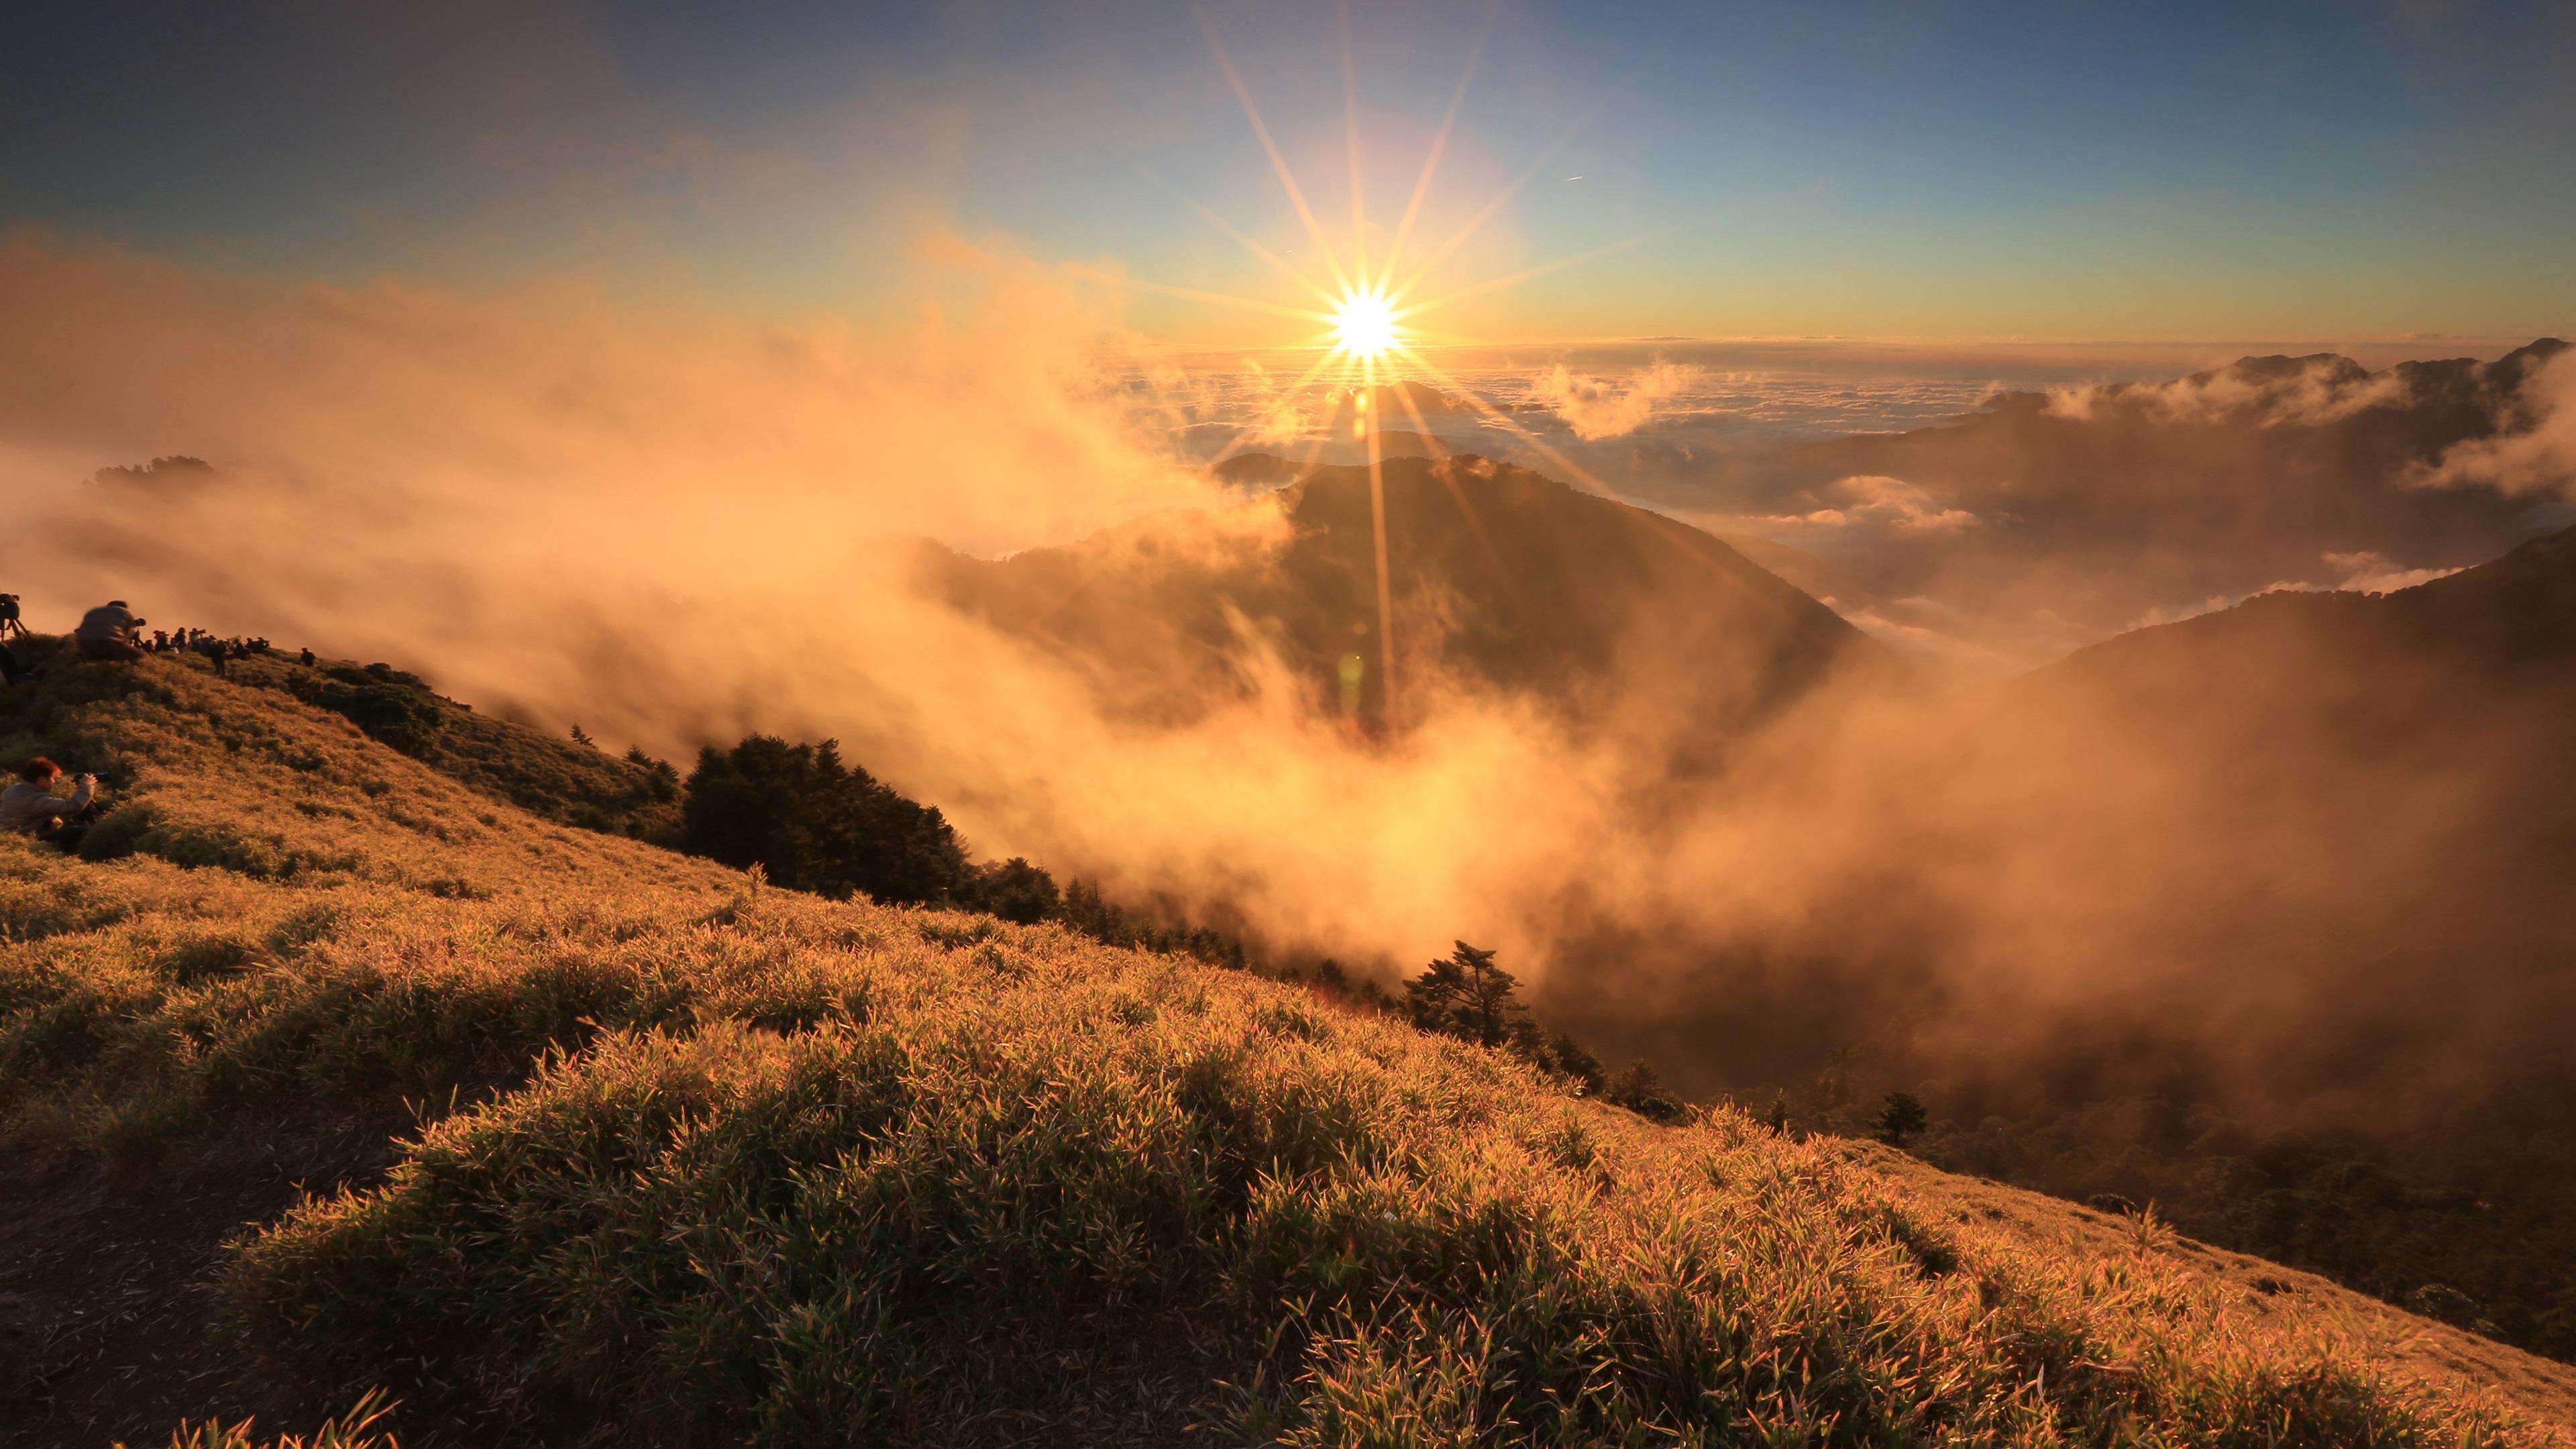 Wallpaper Morning Sunrise Landscape Clouds Mountain Grass